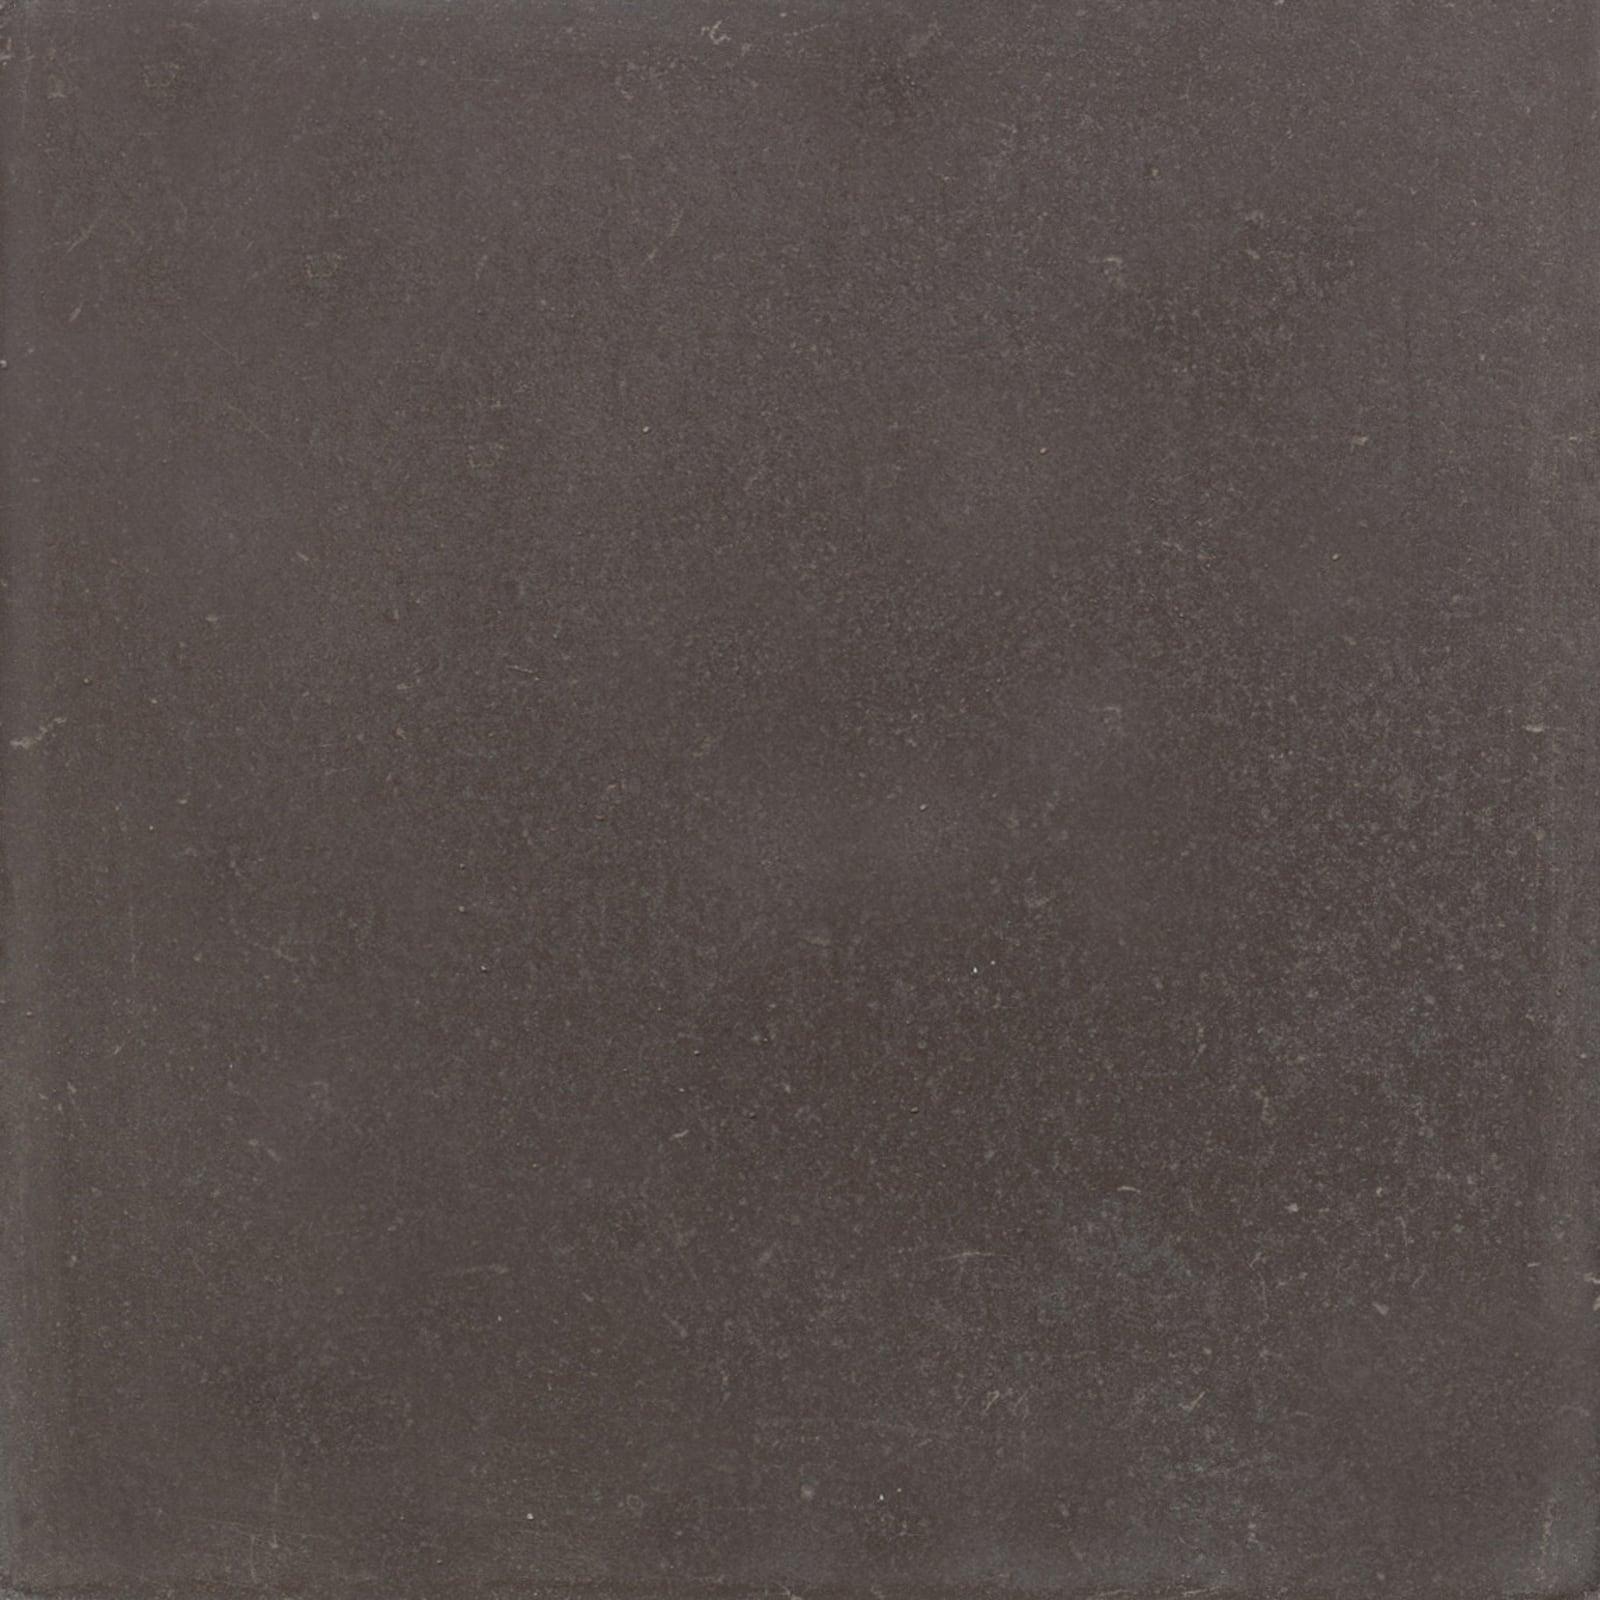 zementfliesen-terrazzofliesen-kreidefarbe-terrazzo-fugenlos-viaplatten-74 | 74